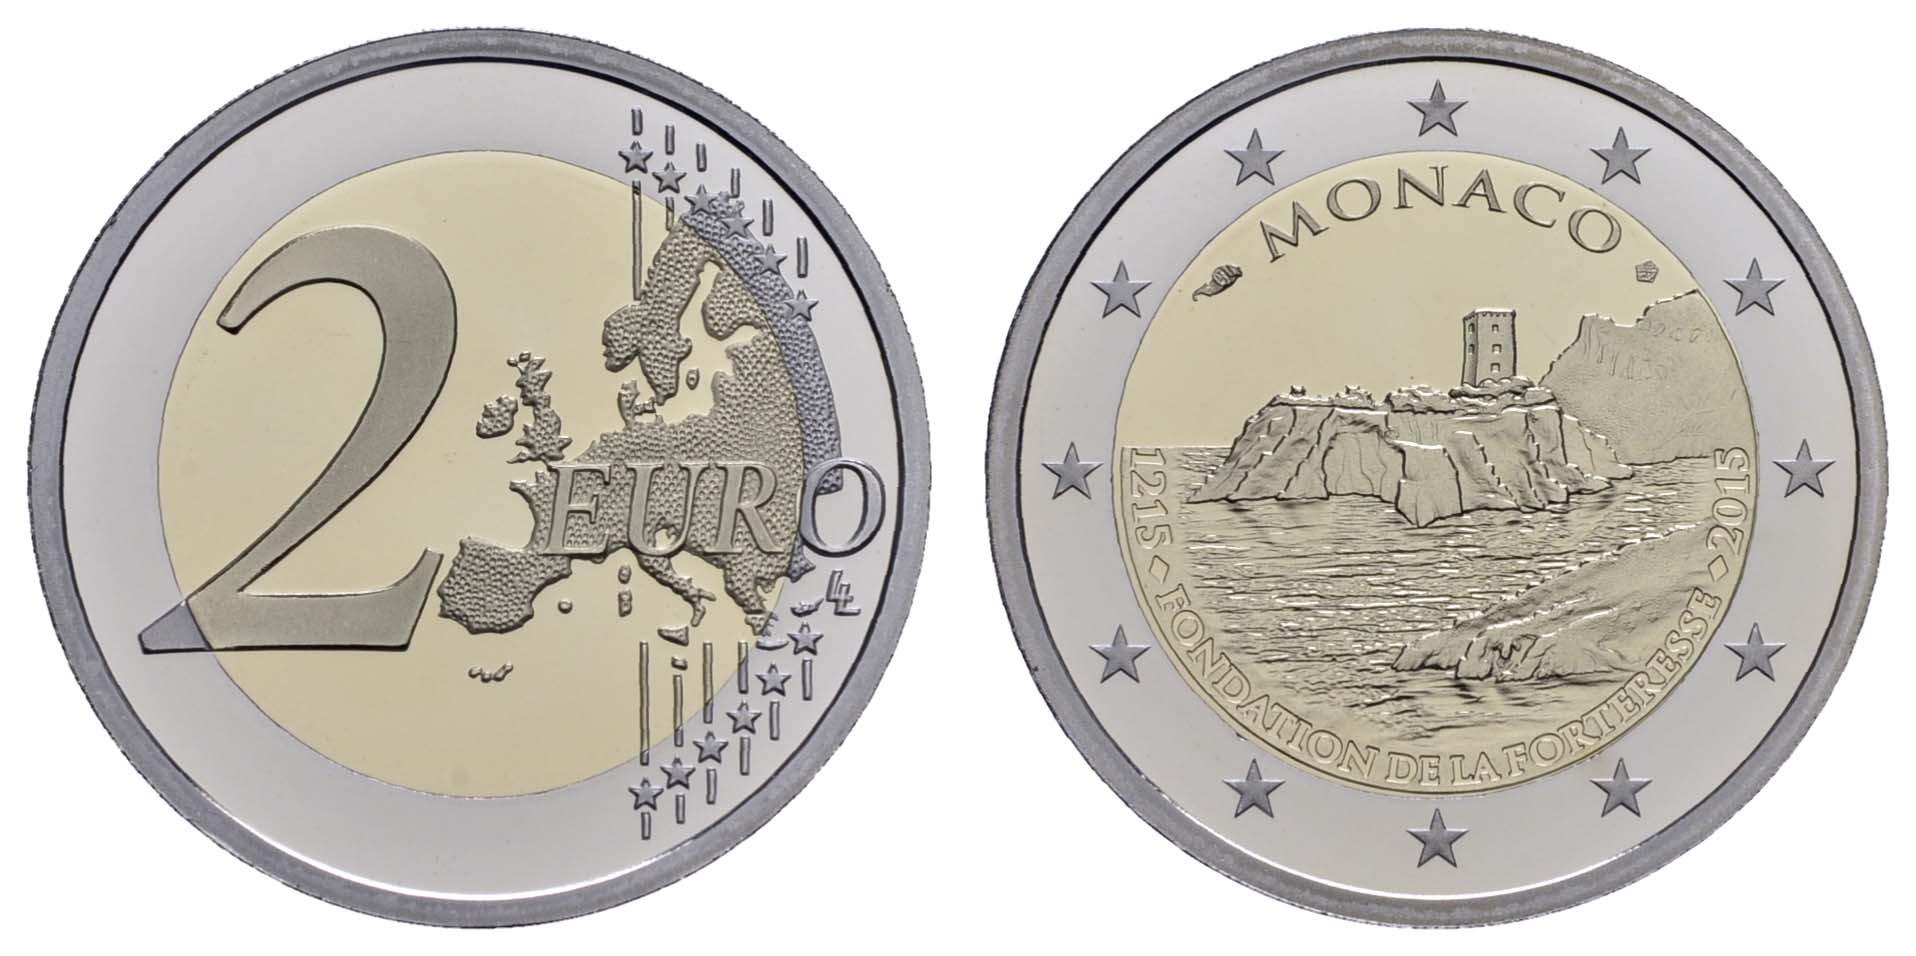 Lot 1837 - europa Euroländer - Monaco -  Auktionshaus Ulrich Felzmann GmbH & Co. KG Coins single lots